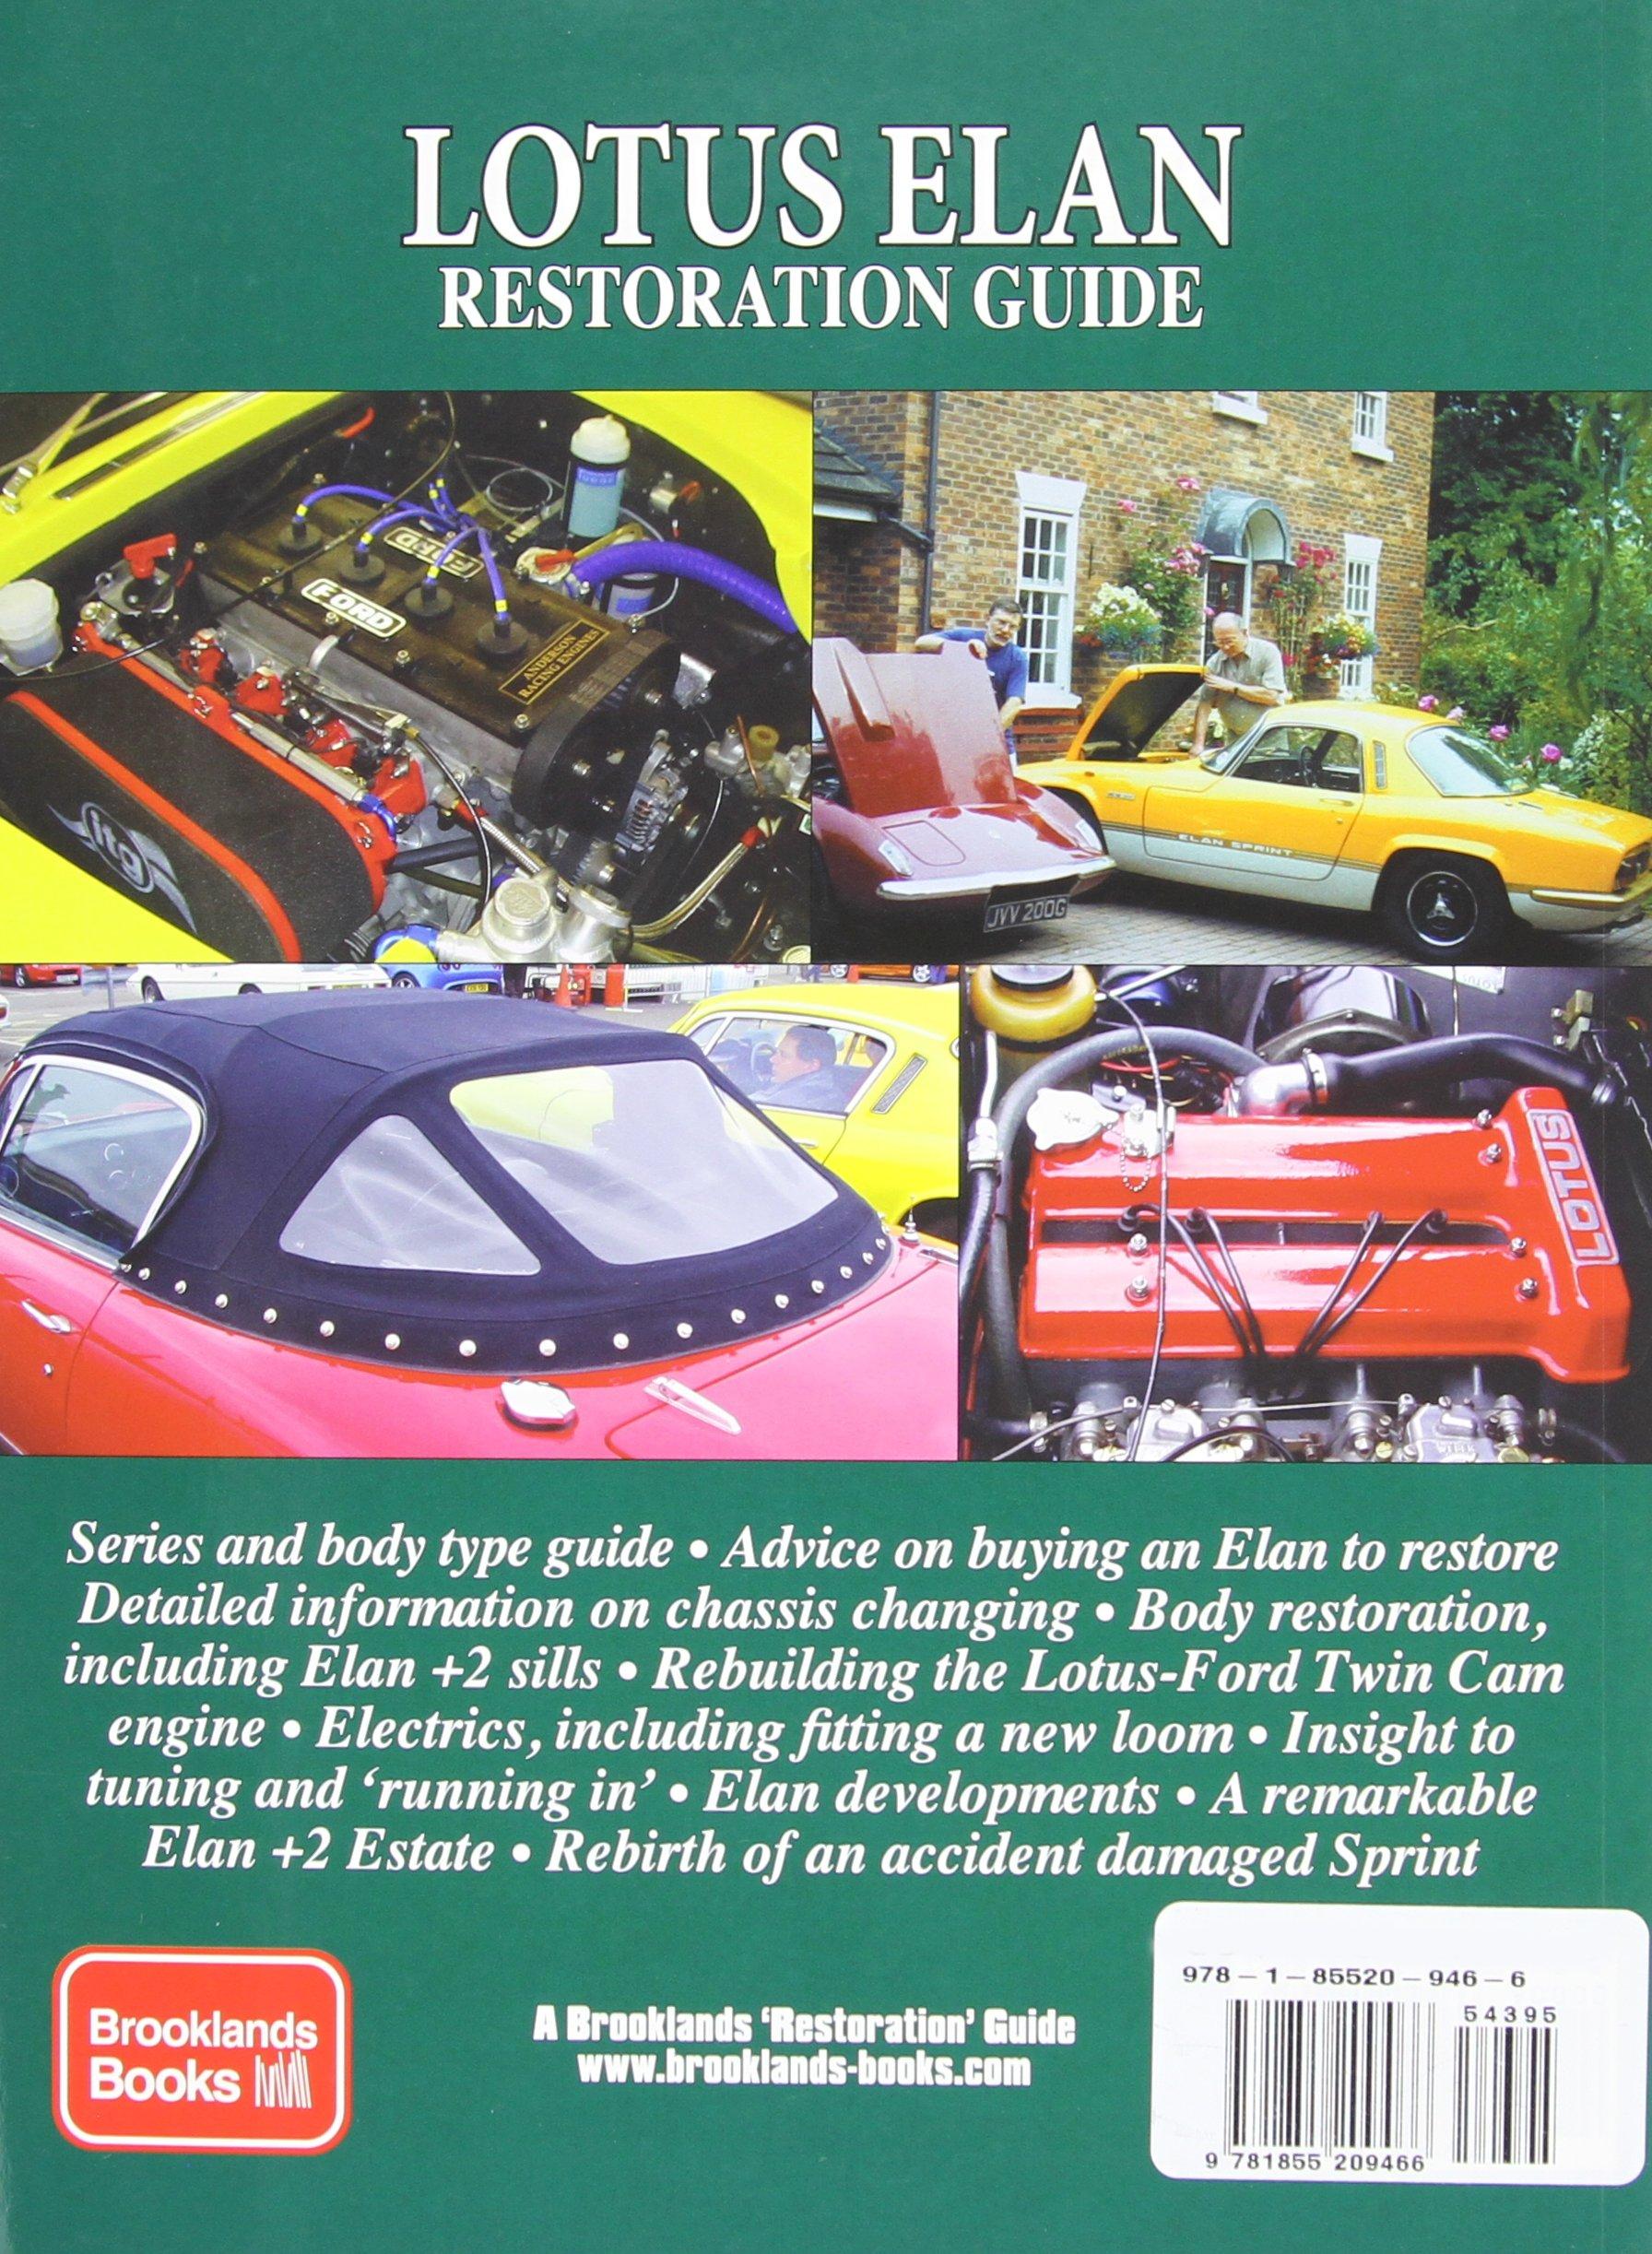 Lotus Elan Restoration Guide New Enlarged Edition Including 2 /& Sprint Buying